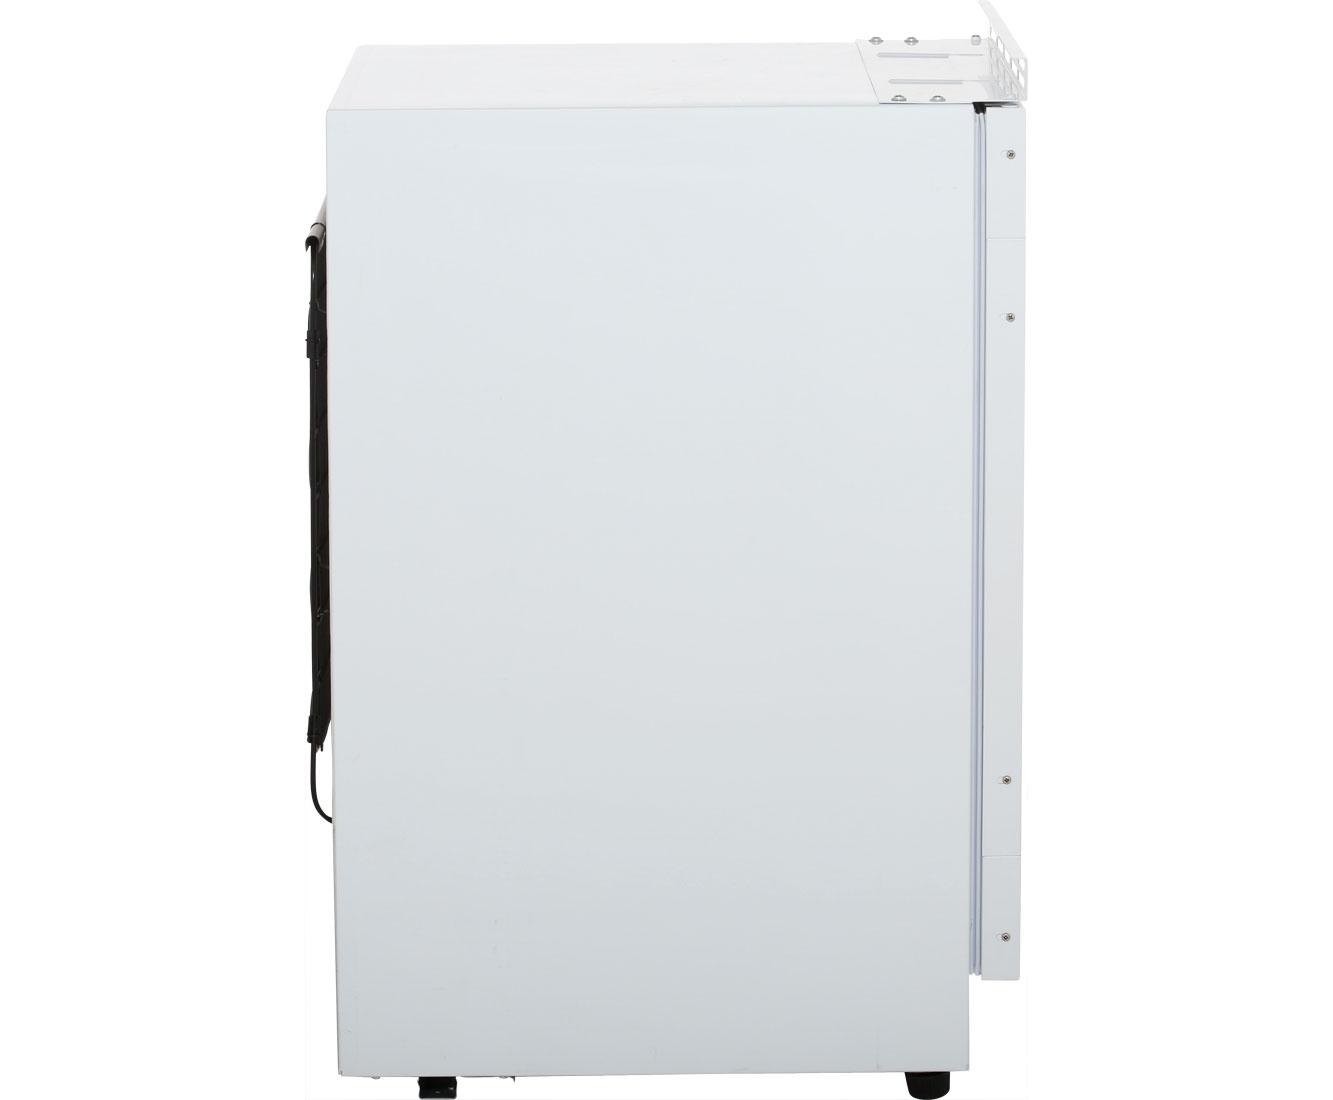 Gorenje Kühlschrank 50 Cm Breit : Gorenje ru a kühlschrank unterbau cm weiss neu ebay